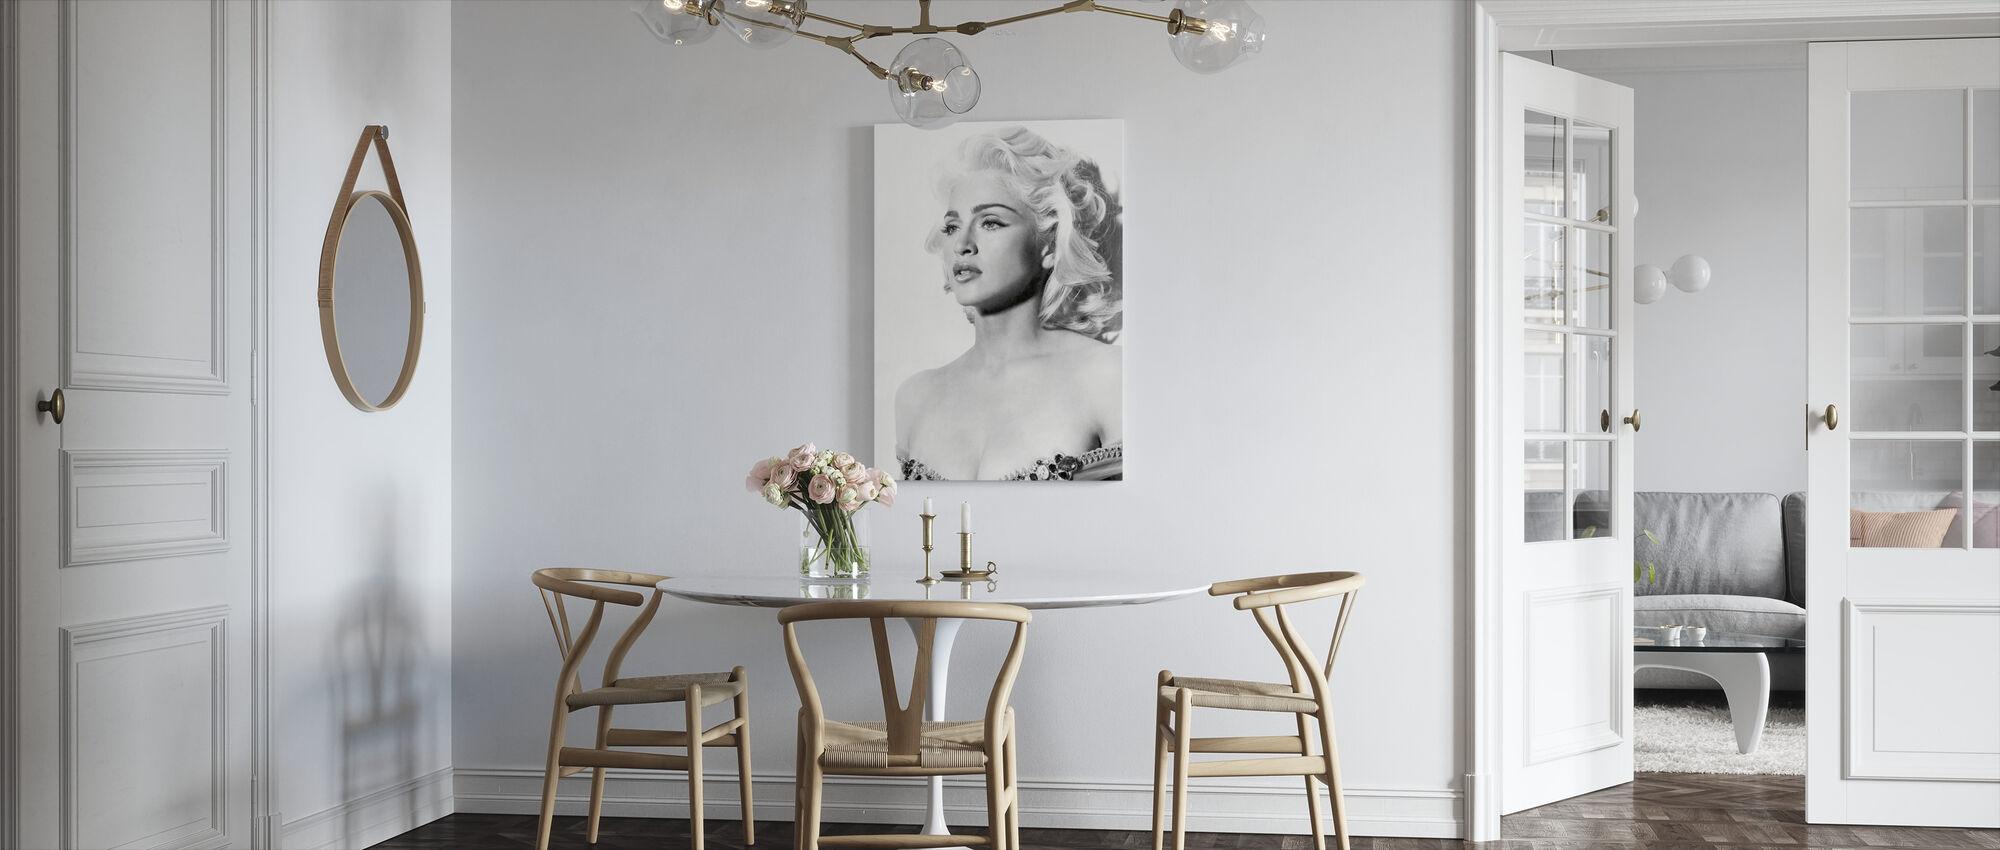 Madonna in Truth or Dare - Canvas print - Kitchen